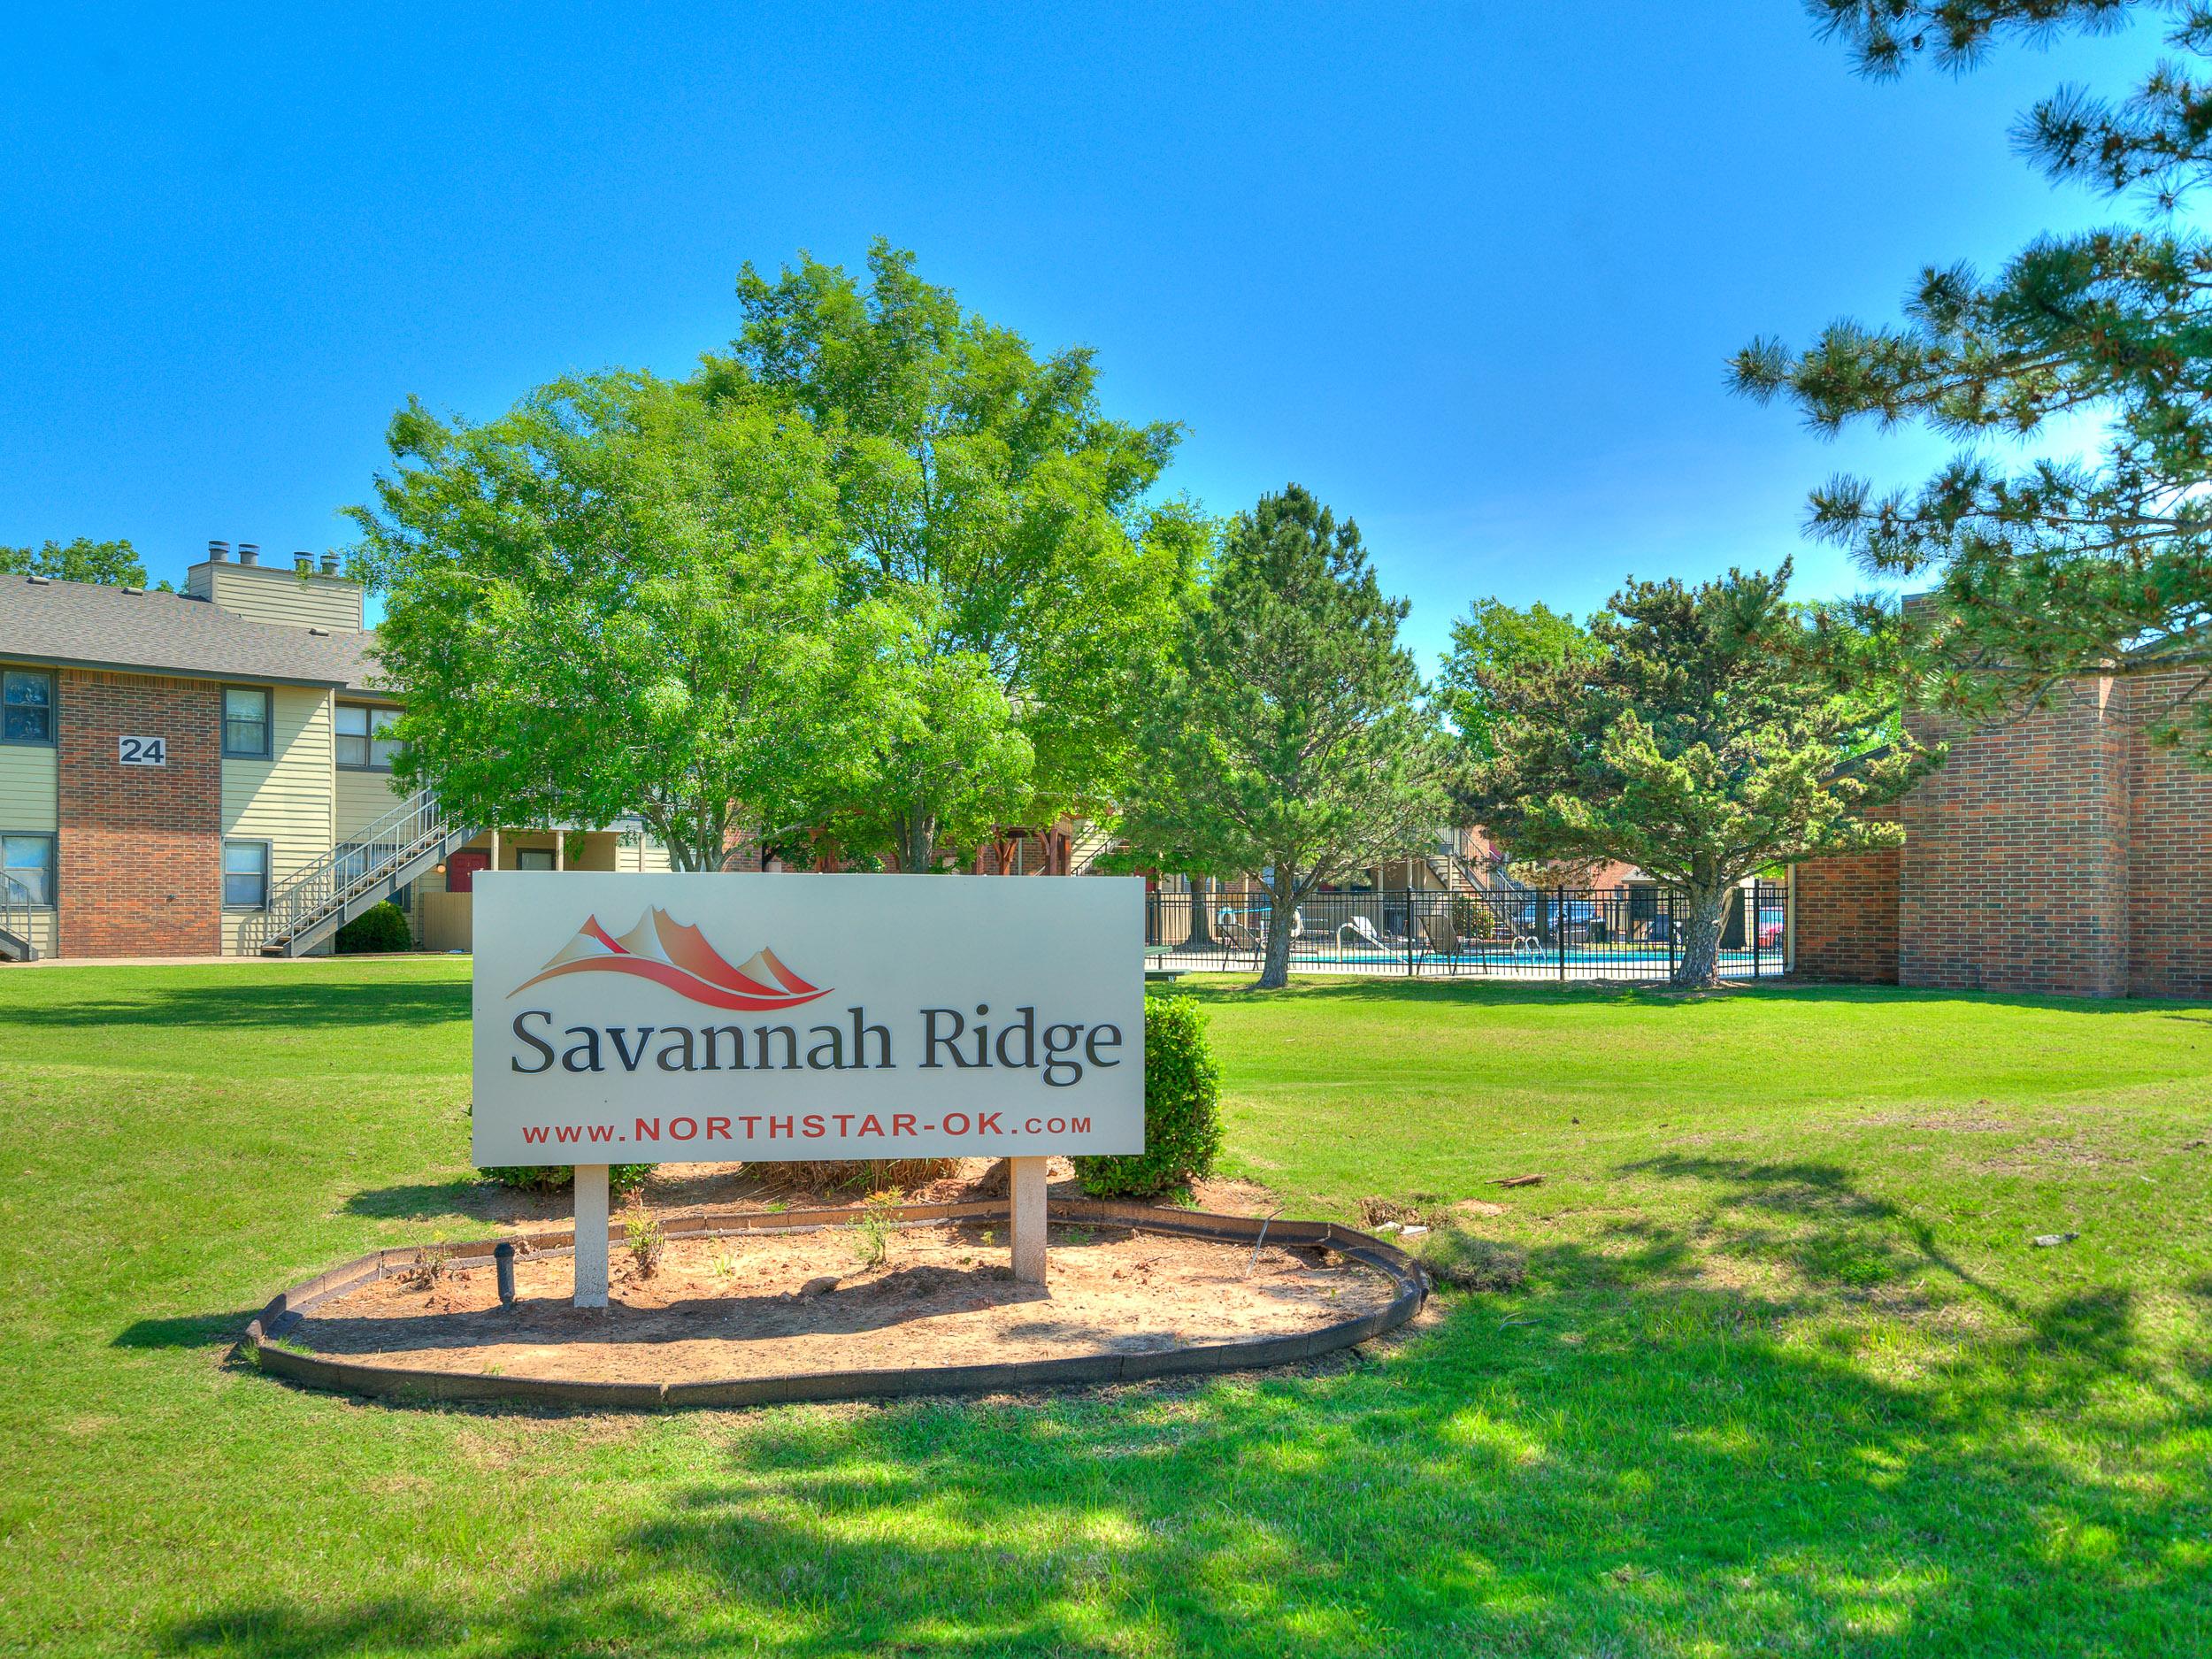 Savannah Ridge Pool Grill-13.jpg